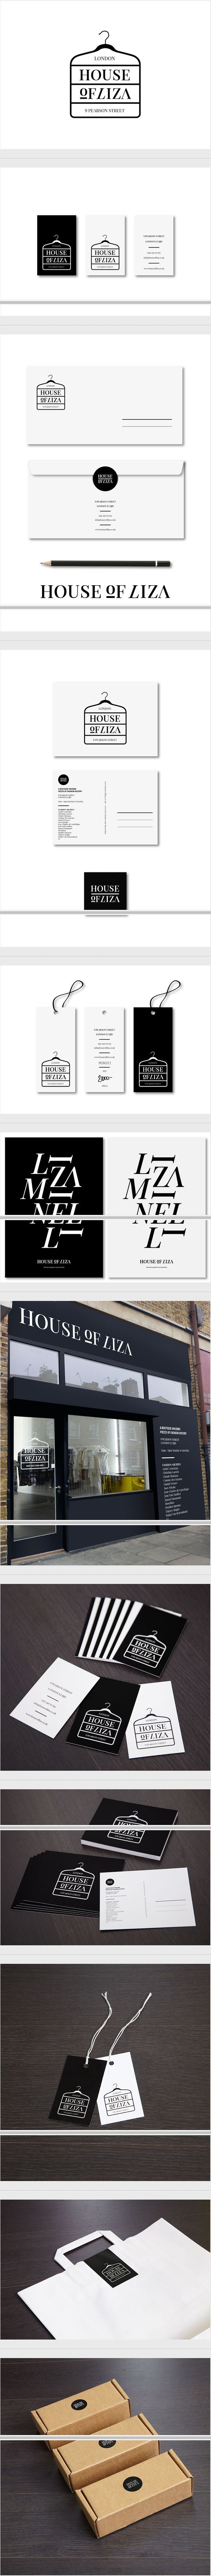 House of Liza   Designer: Kissmiklos